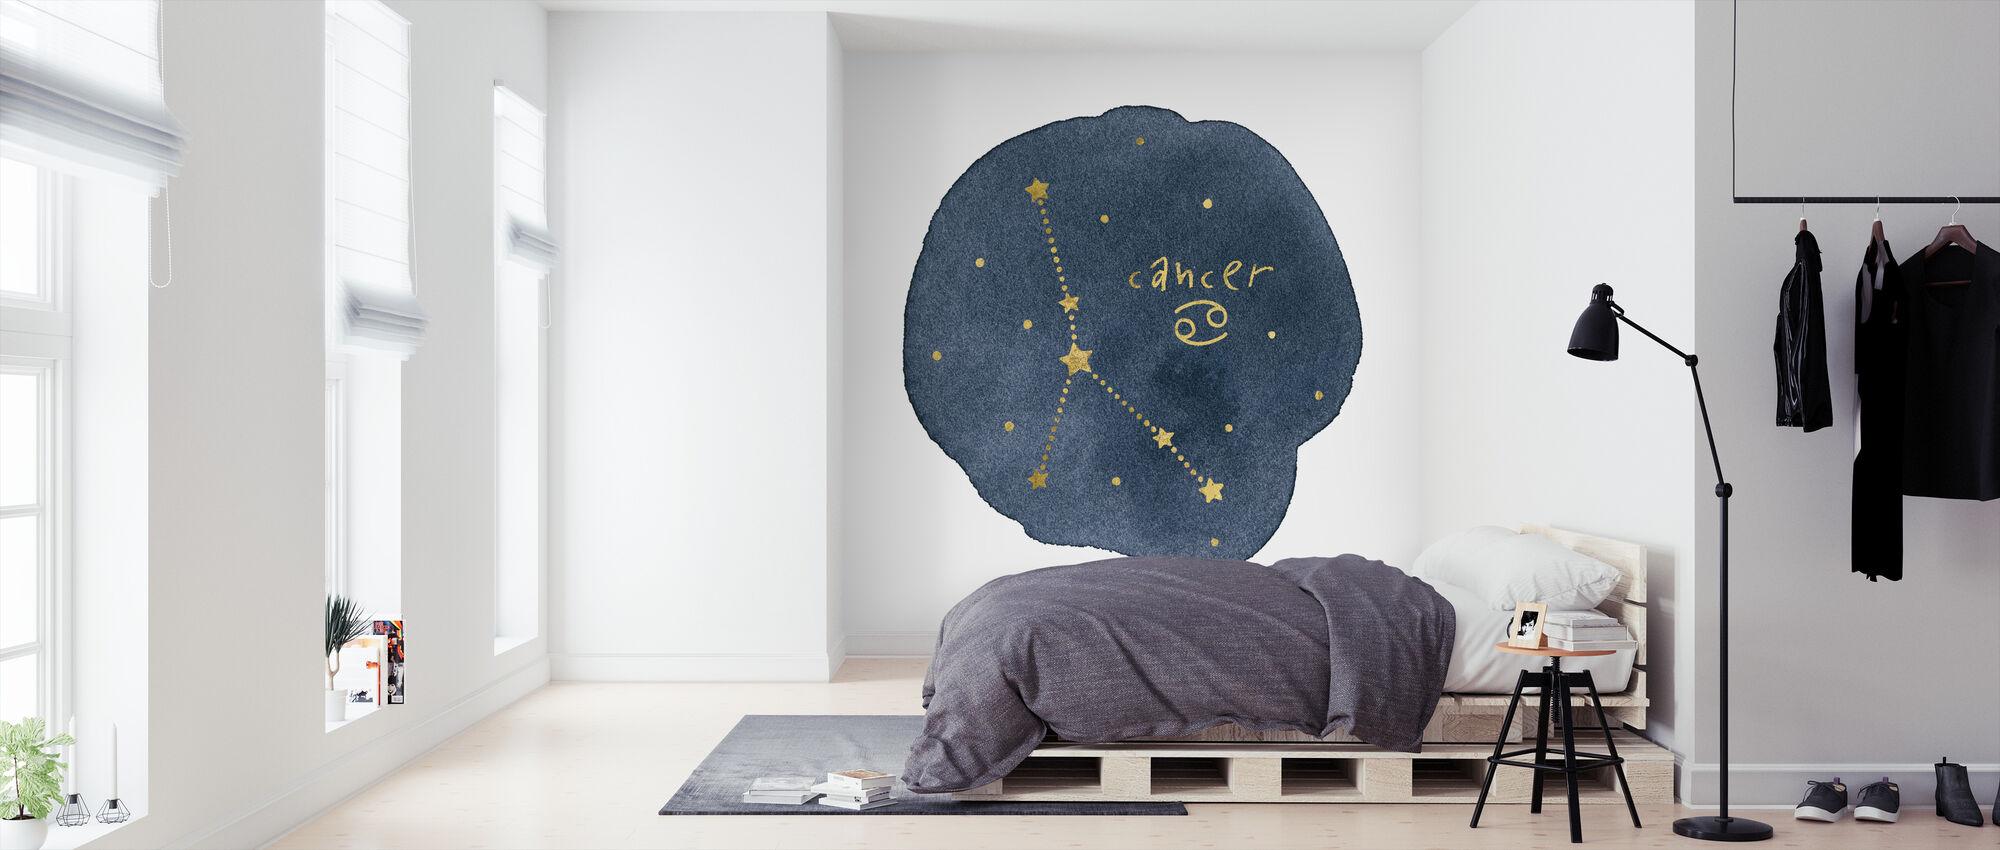 Horoscoop Kanker - Behang - Slaapkamer